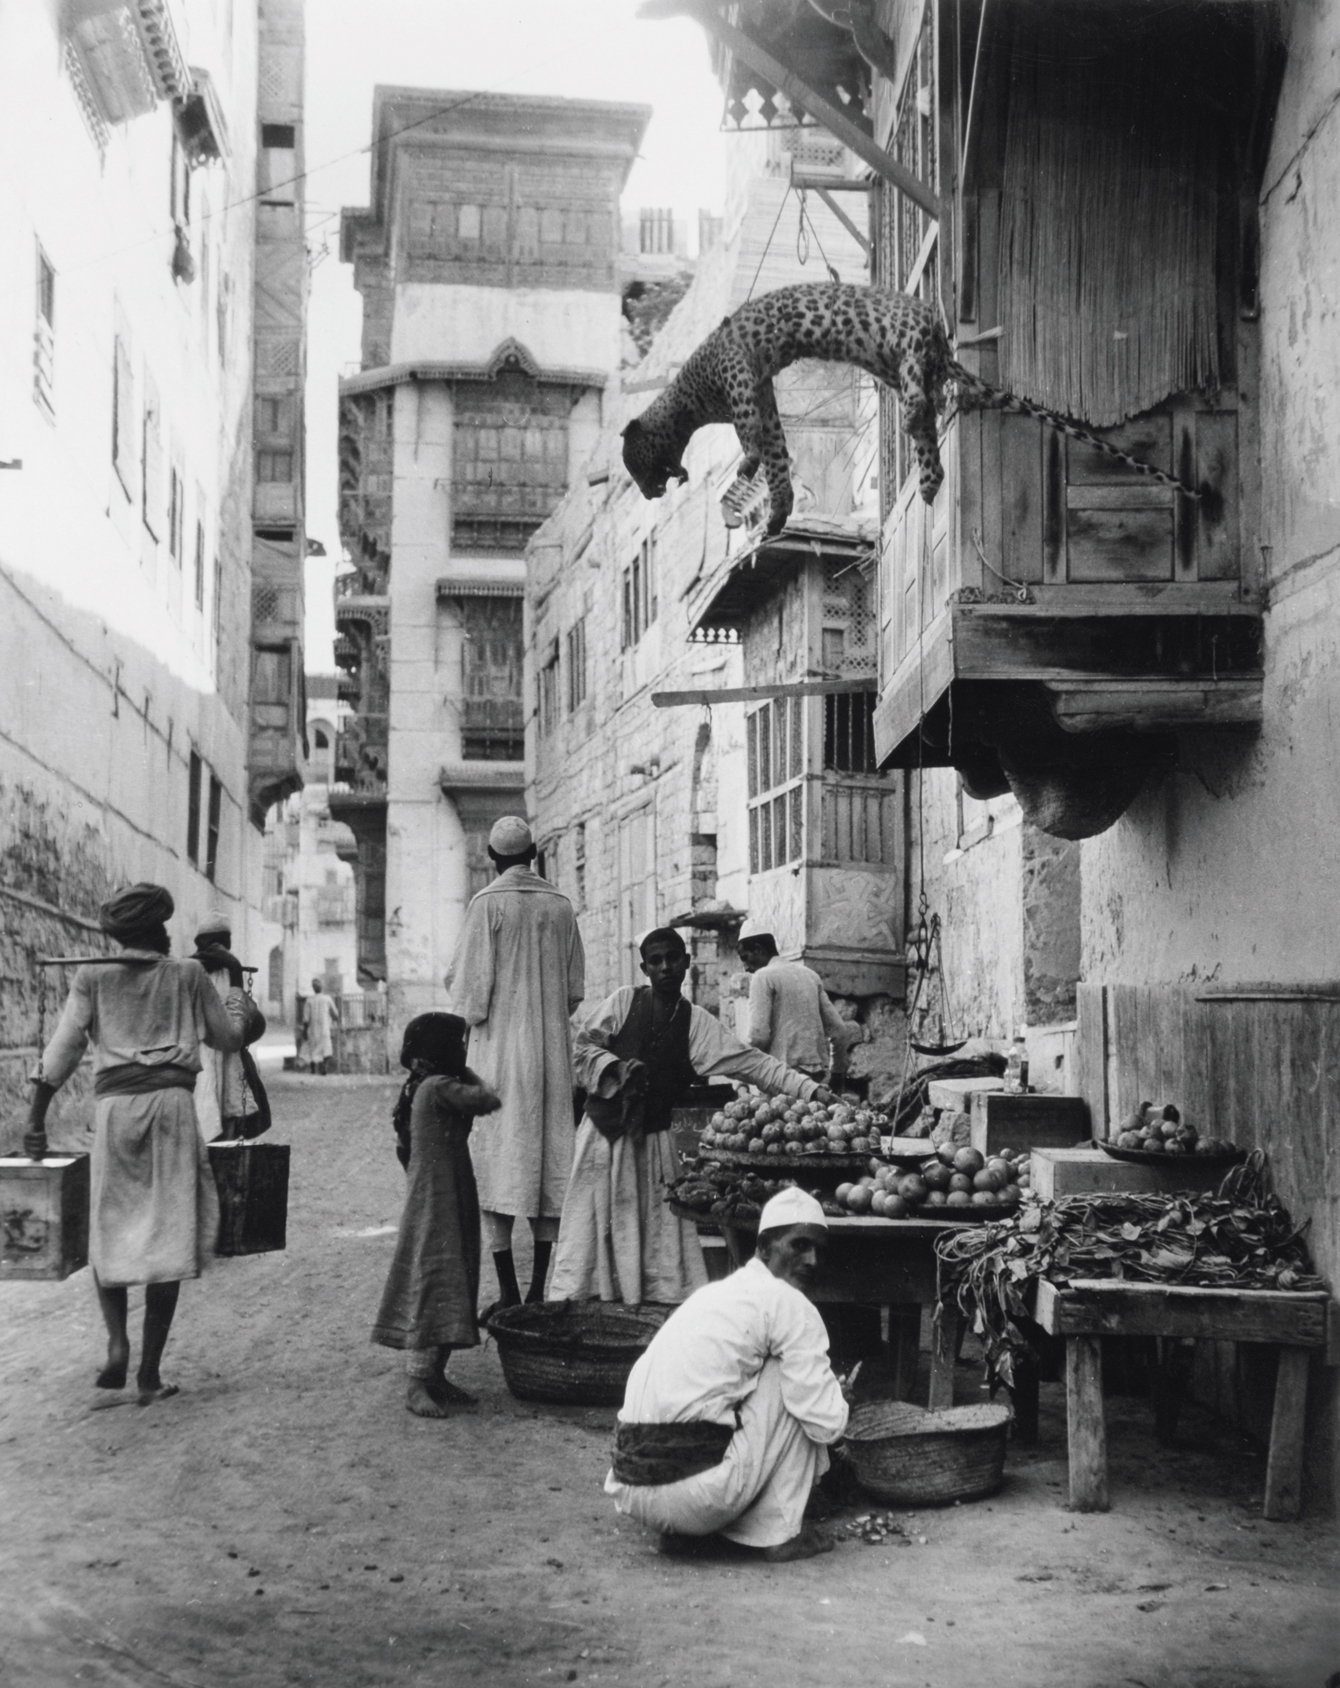 Paul Almasy_Saoudi Arabie_ca 1950.jpg